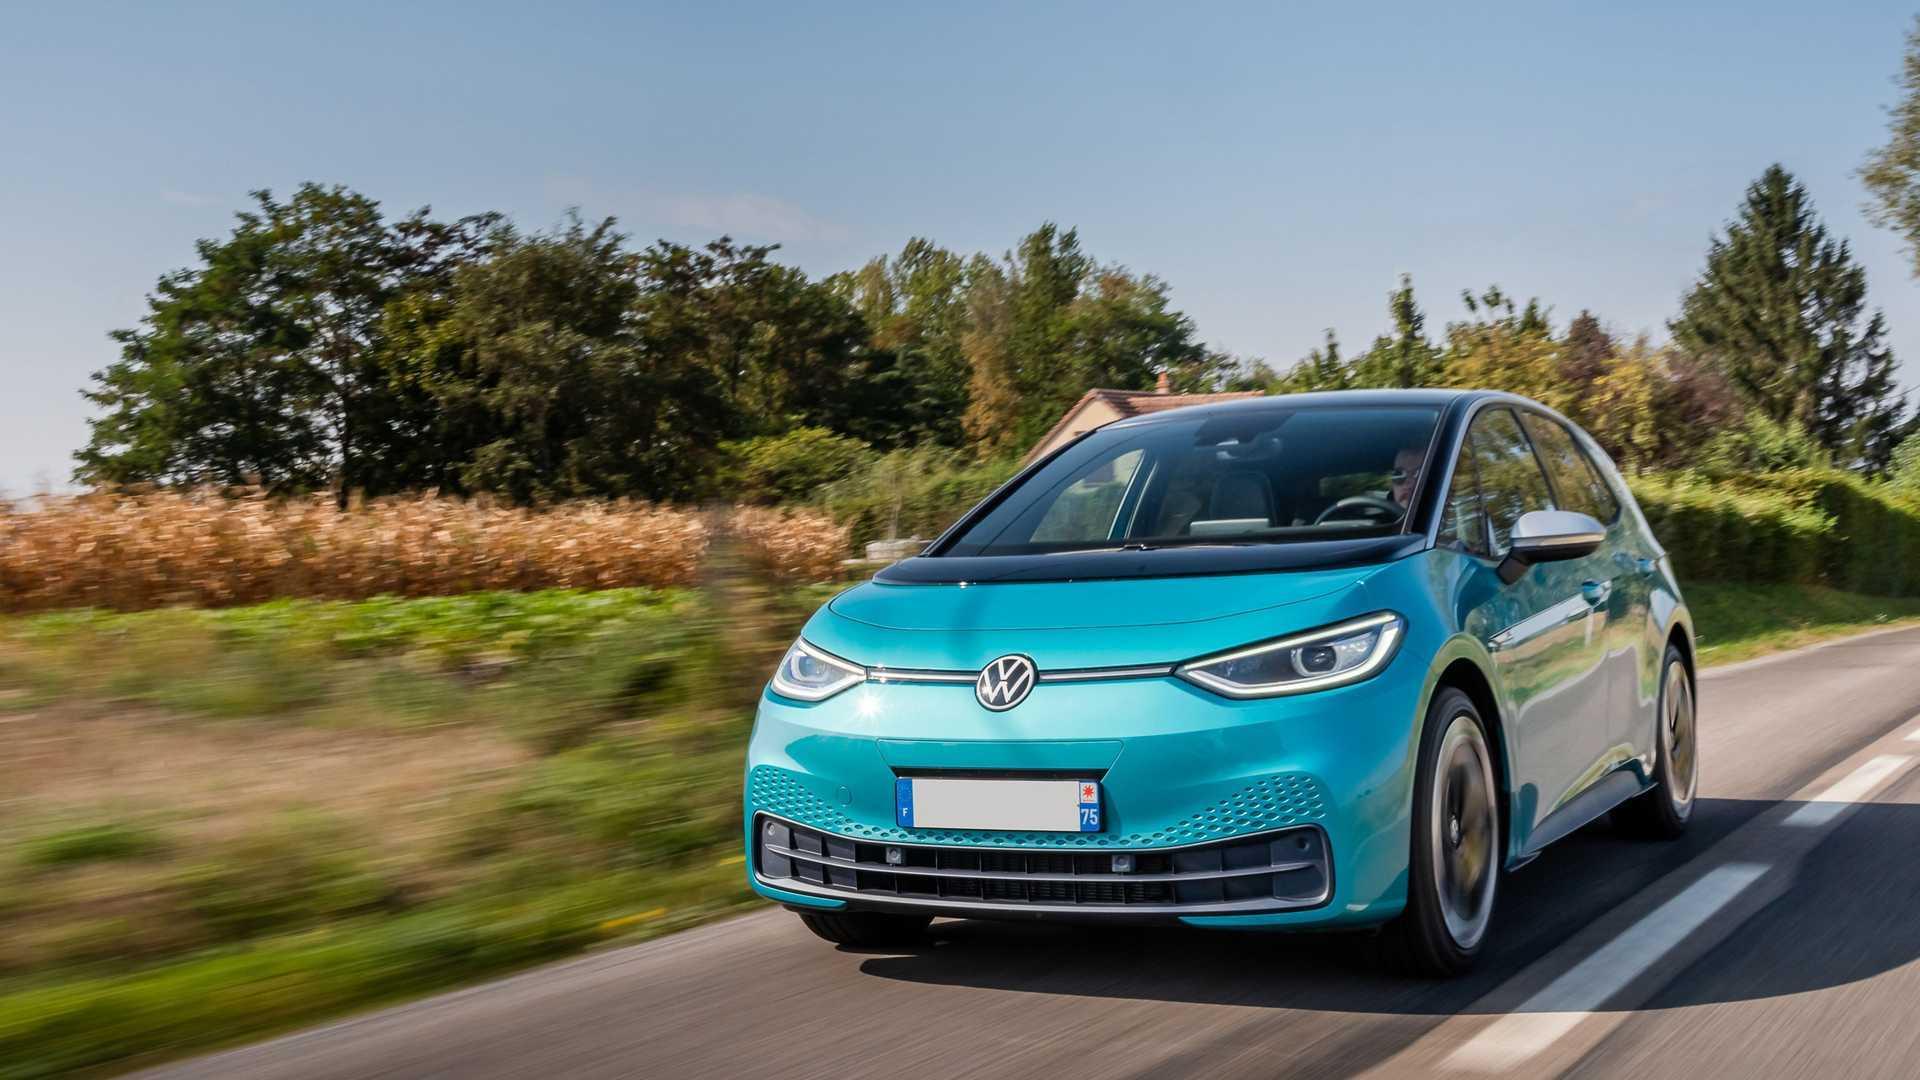 Teste Volkswagen ID.3 (2020) - frente